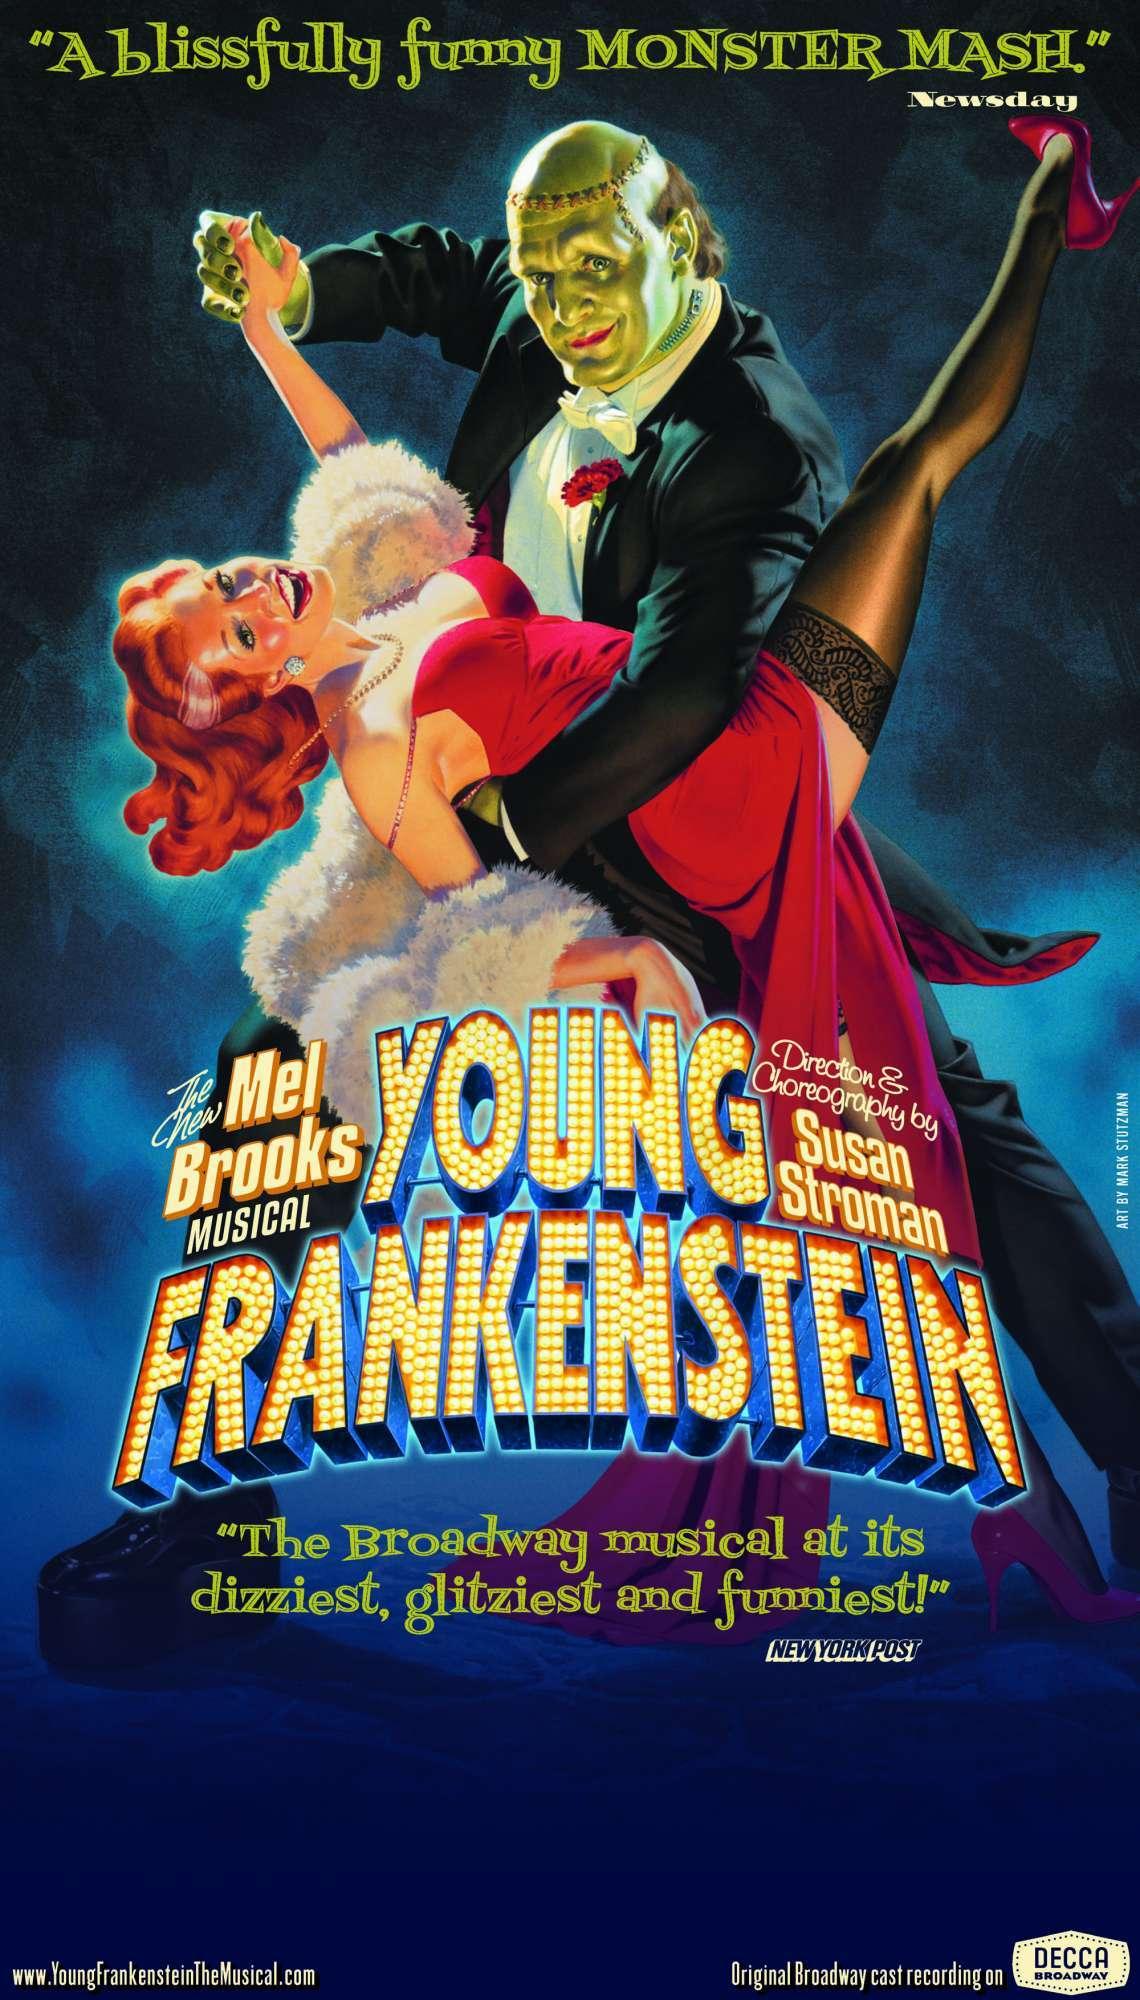 a4585281a1ef476c8e9f_Young-Frankenstein_jpg.jpg